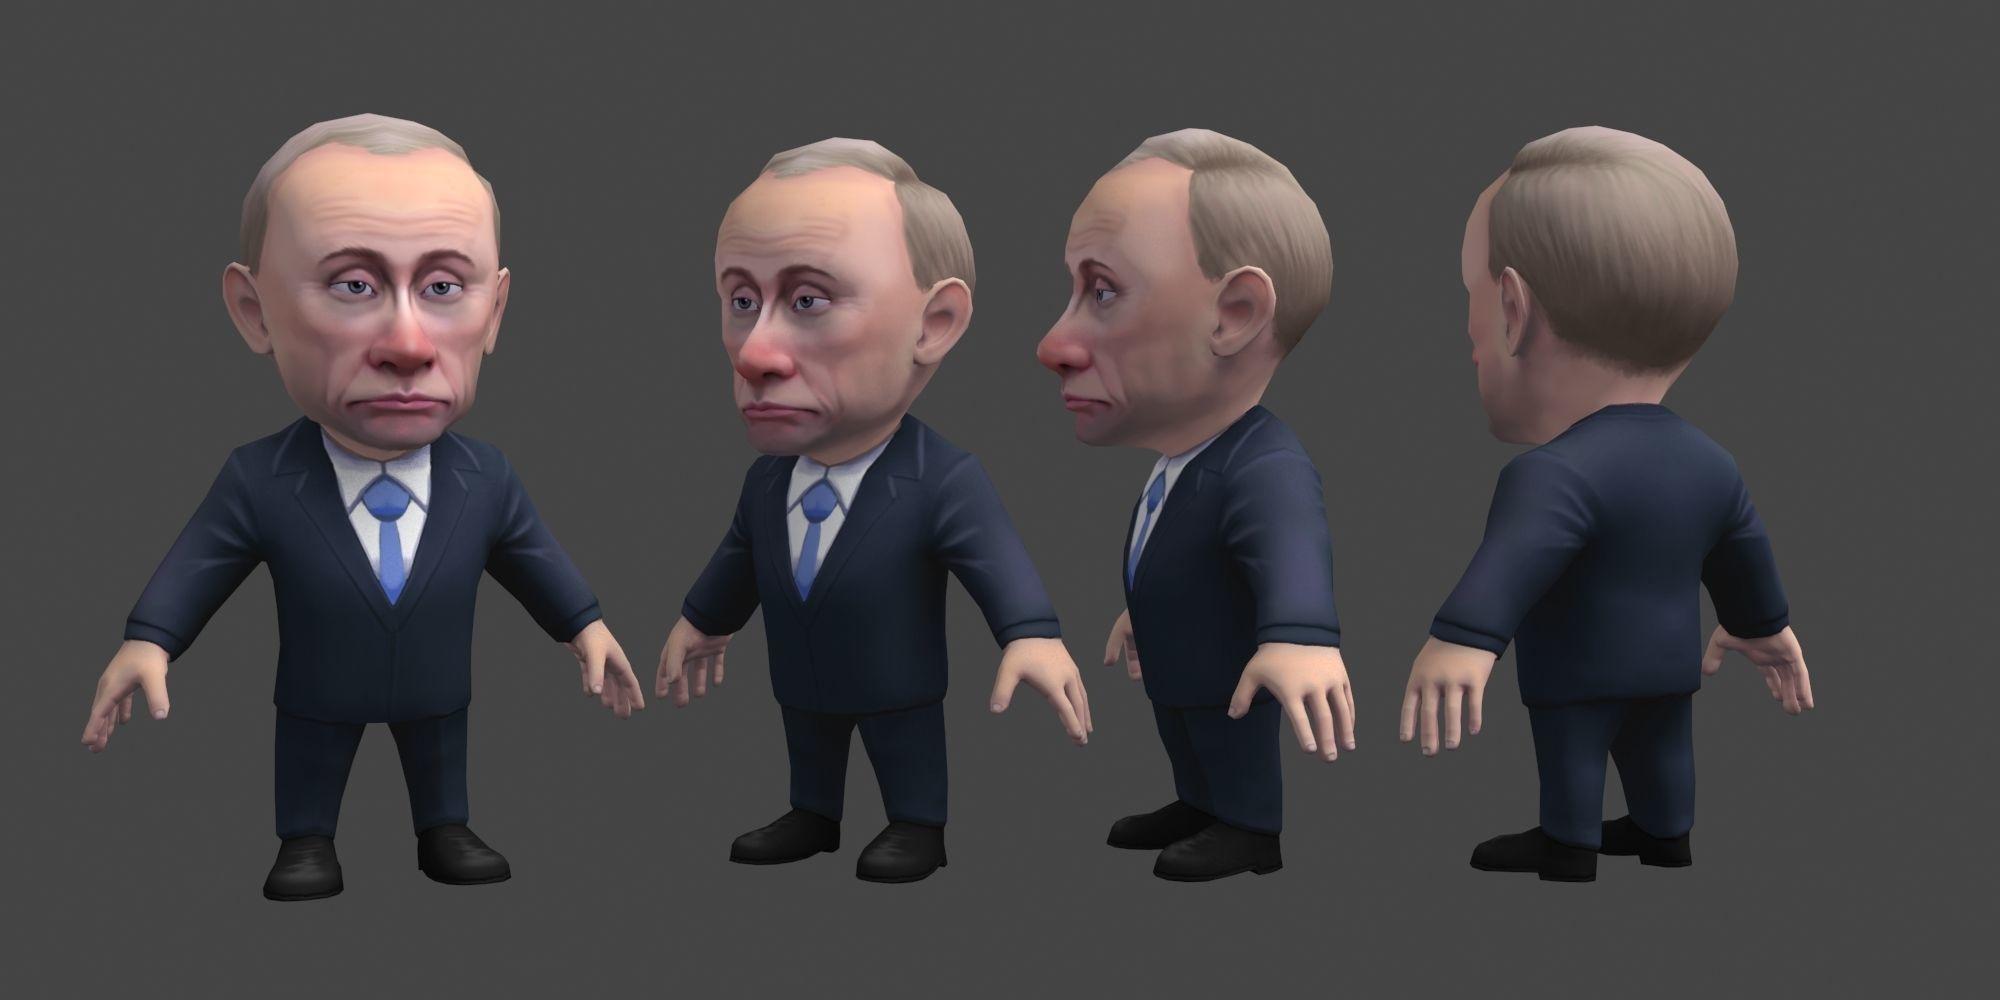 Chibii politicians - Putin - ver1